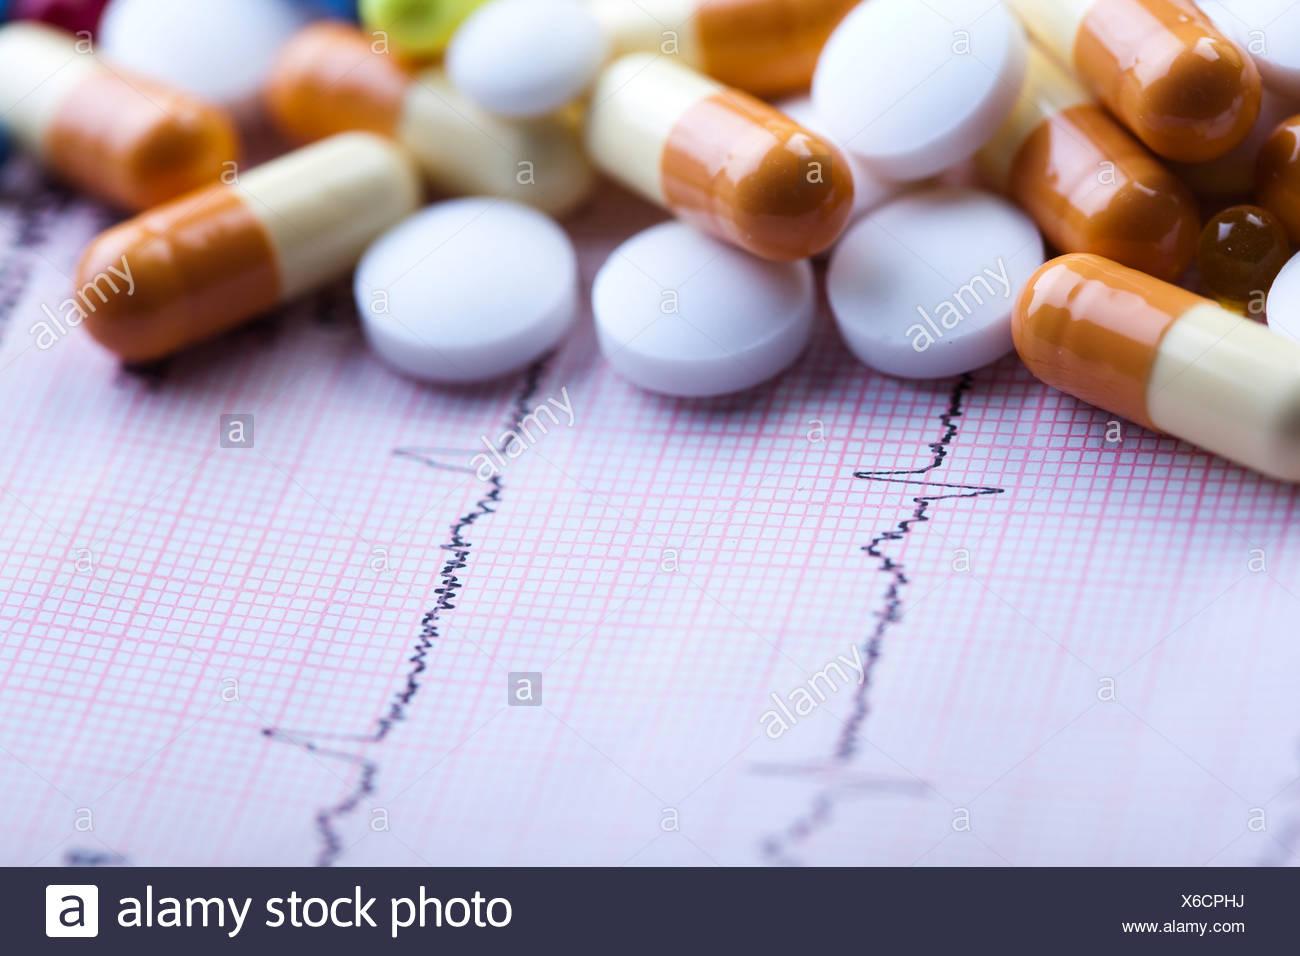 Drugs, medicines, tablets Stock Photo: 279334990 - Alamy